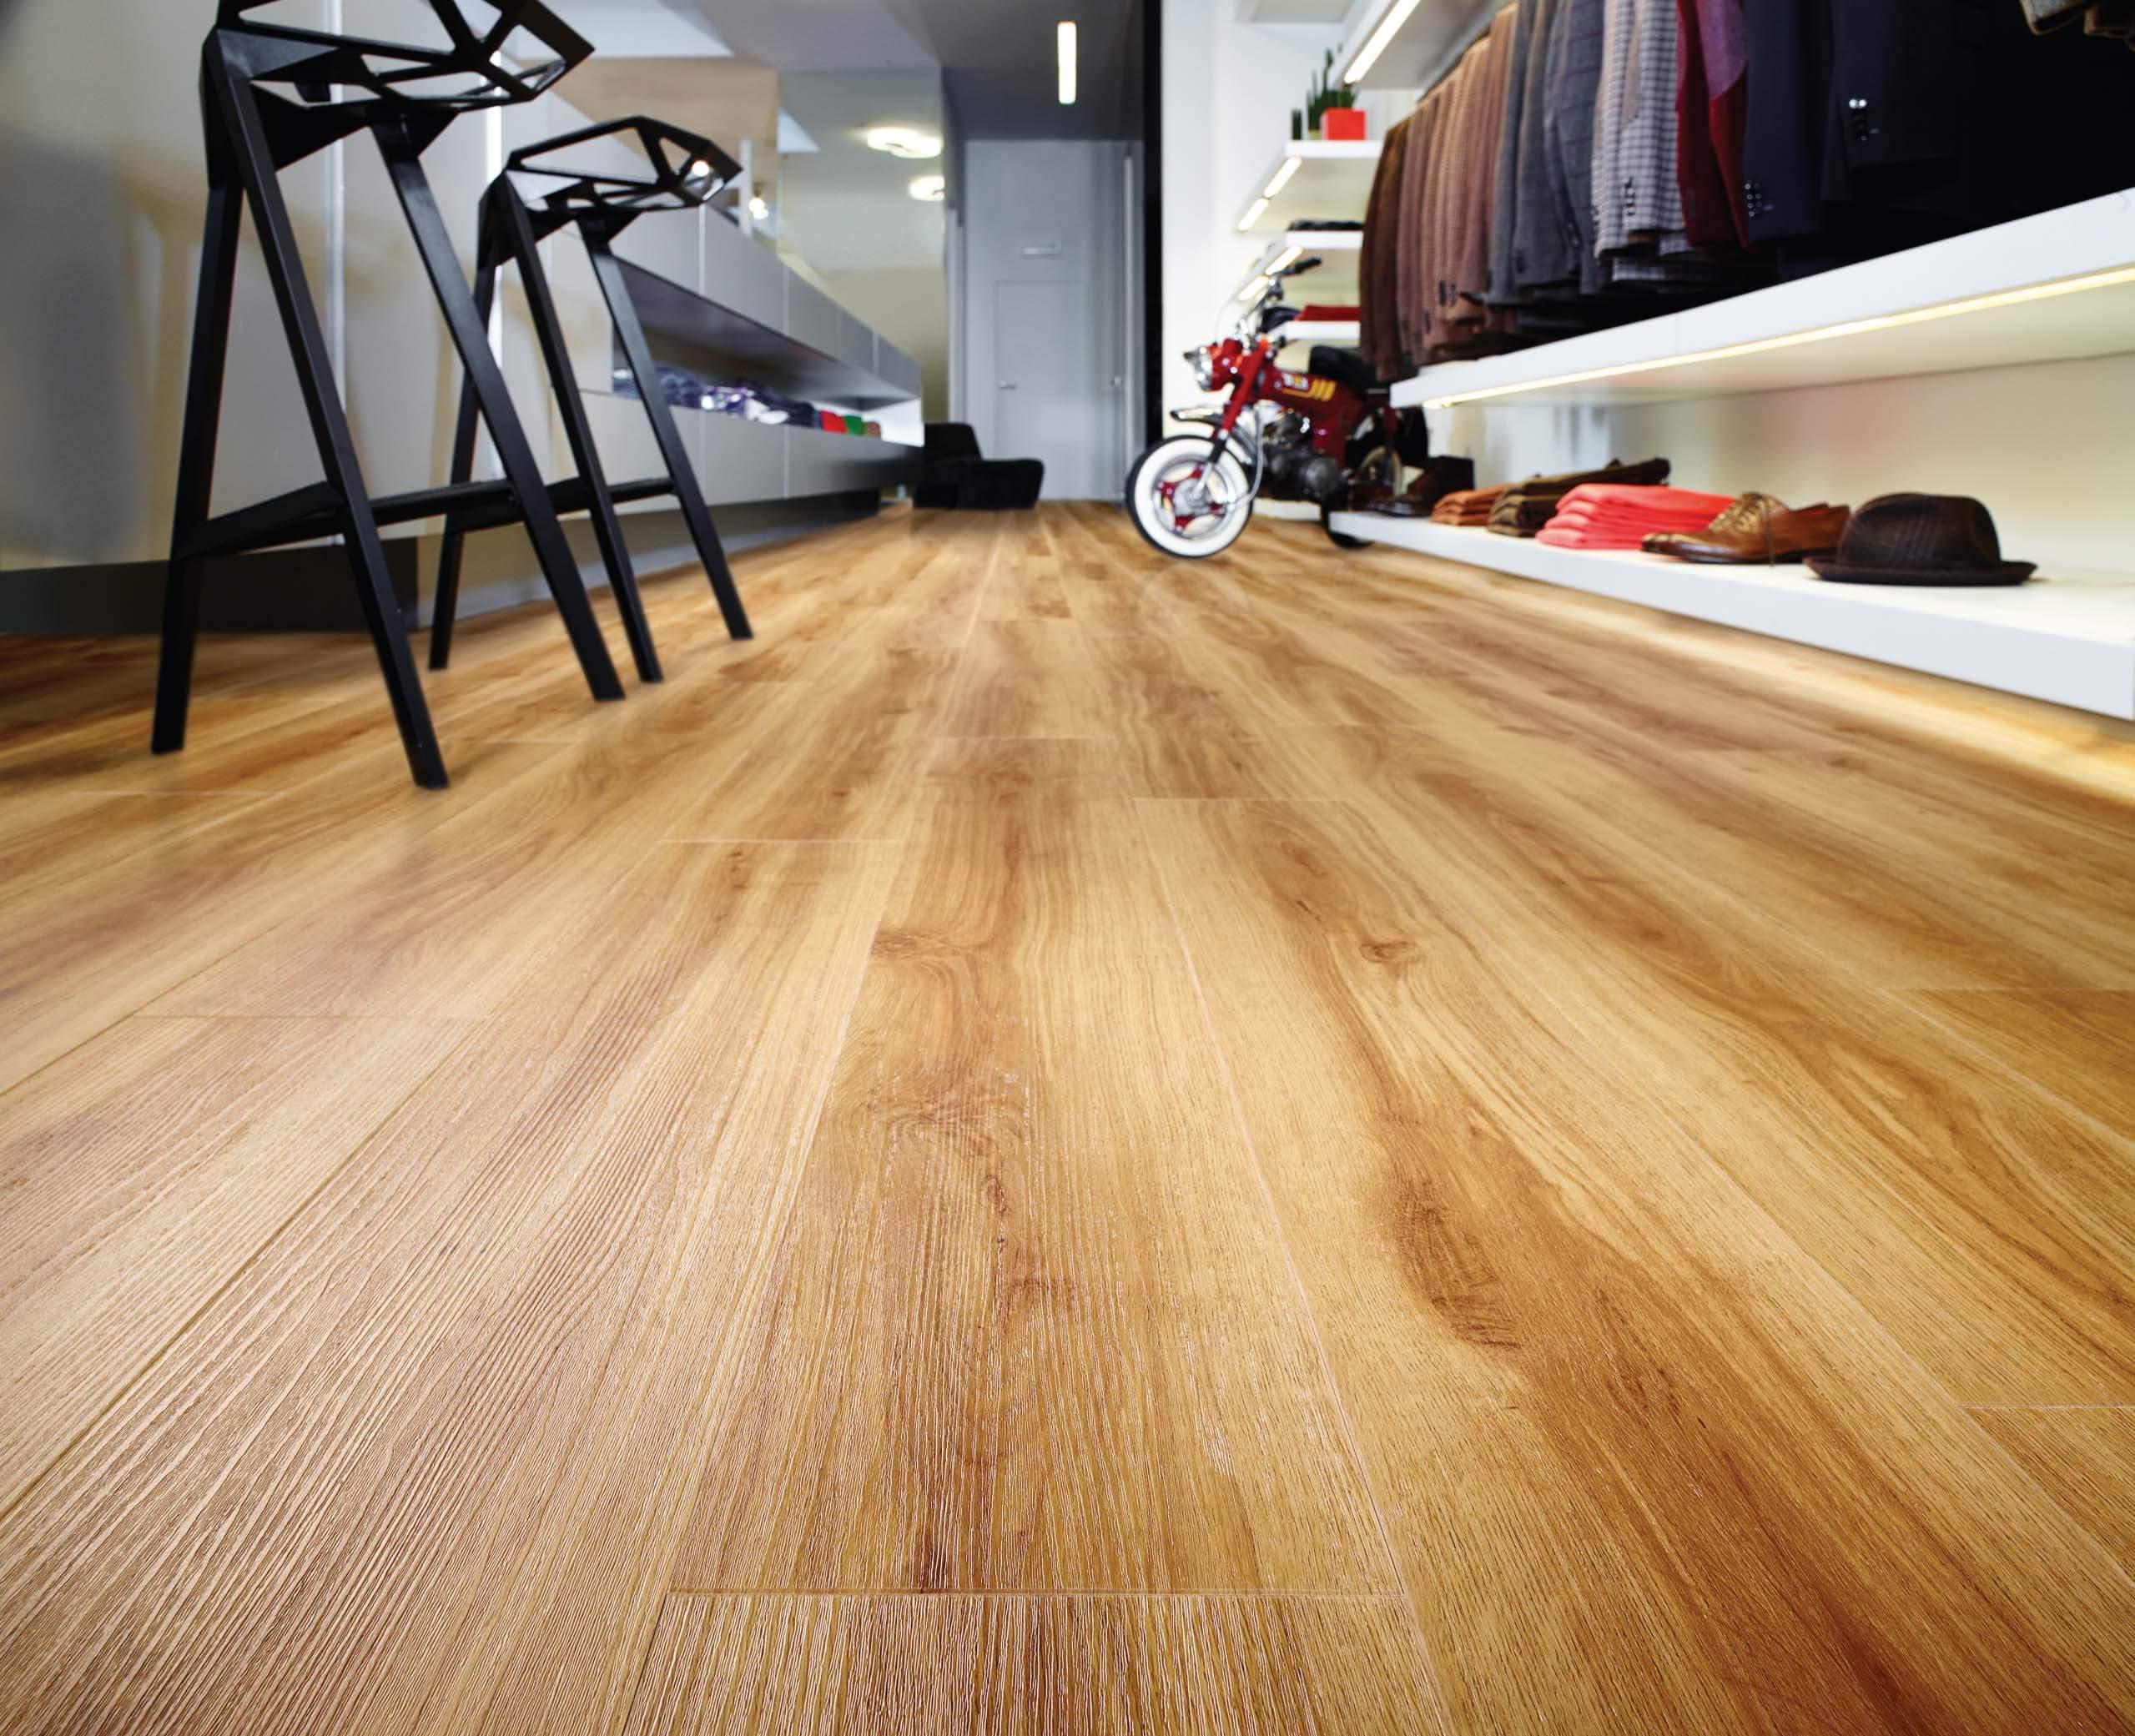 pvc click vinyl laminaat casablanca oak 4 5mm dik natuur eik